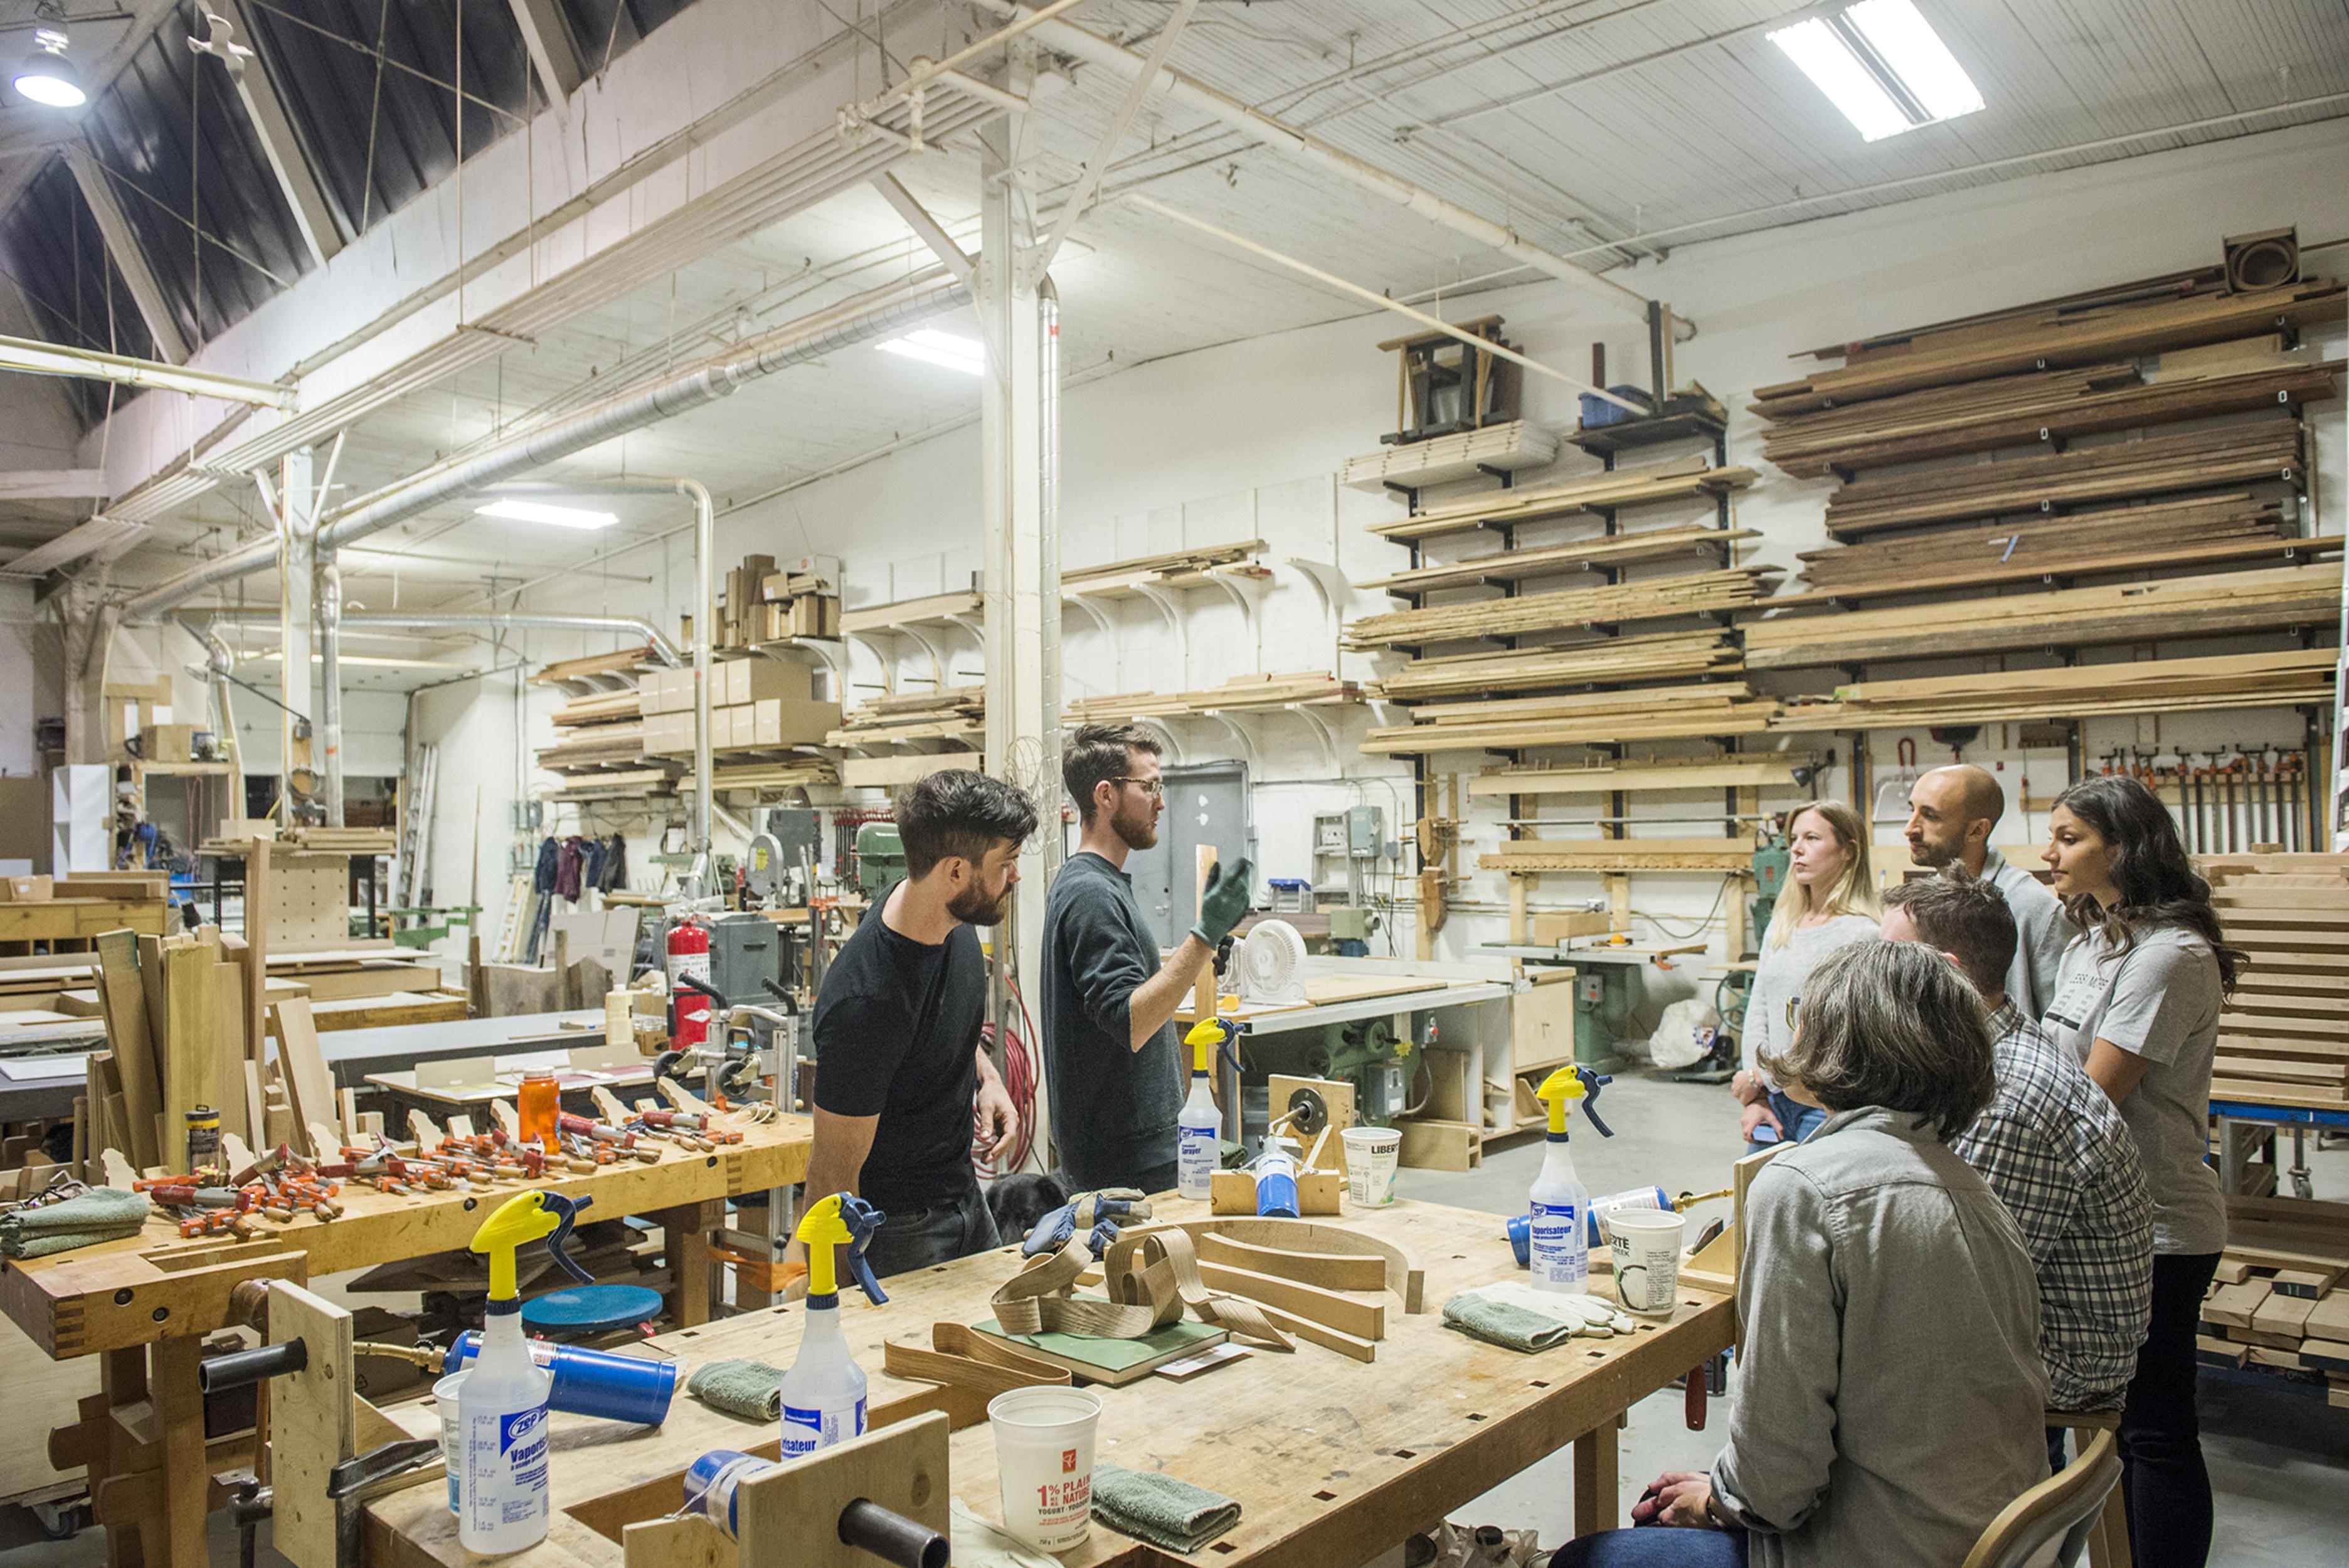 junction workshop toronto